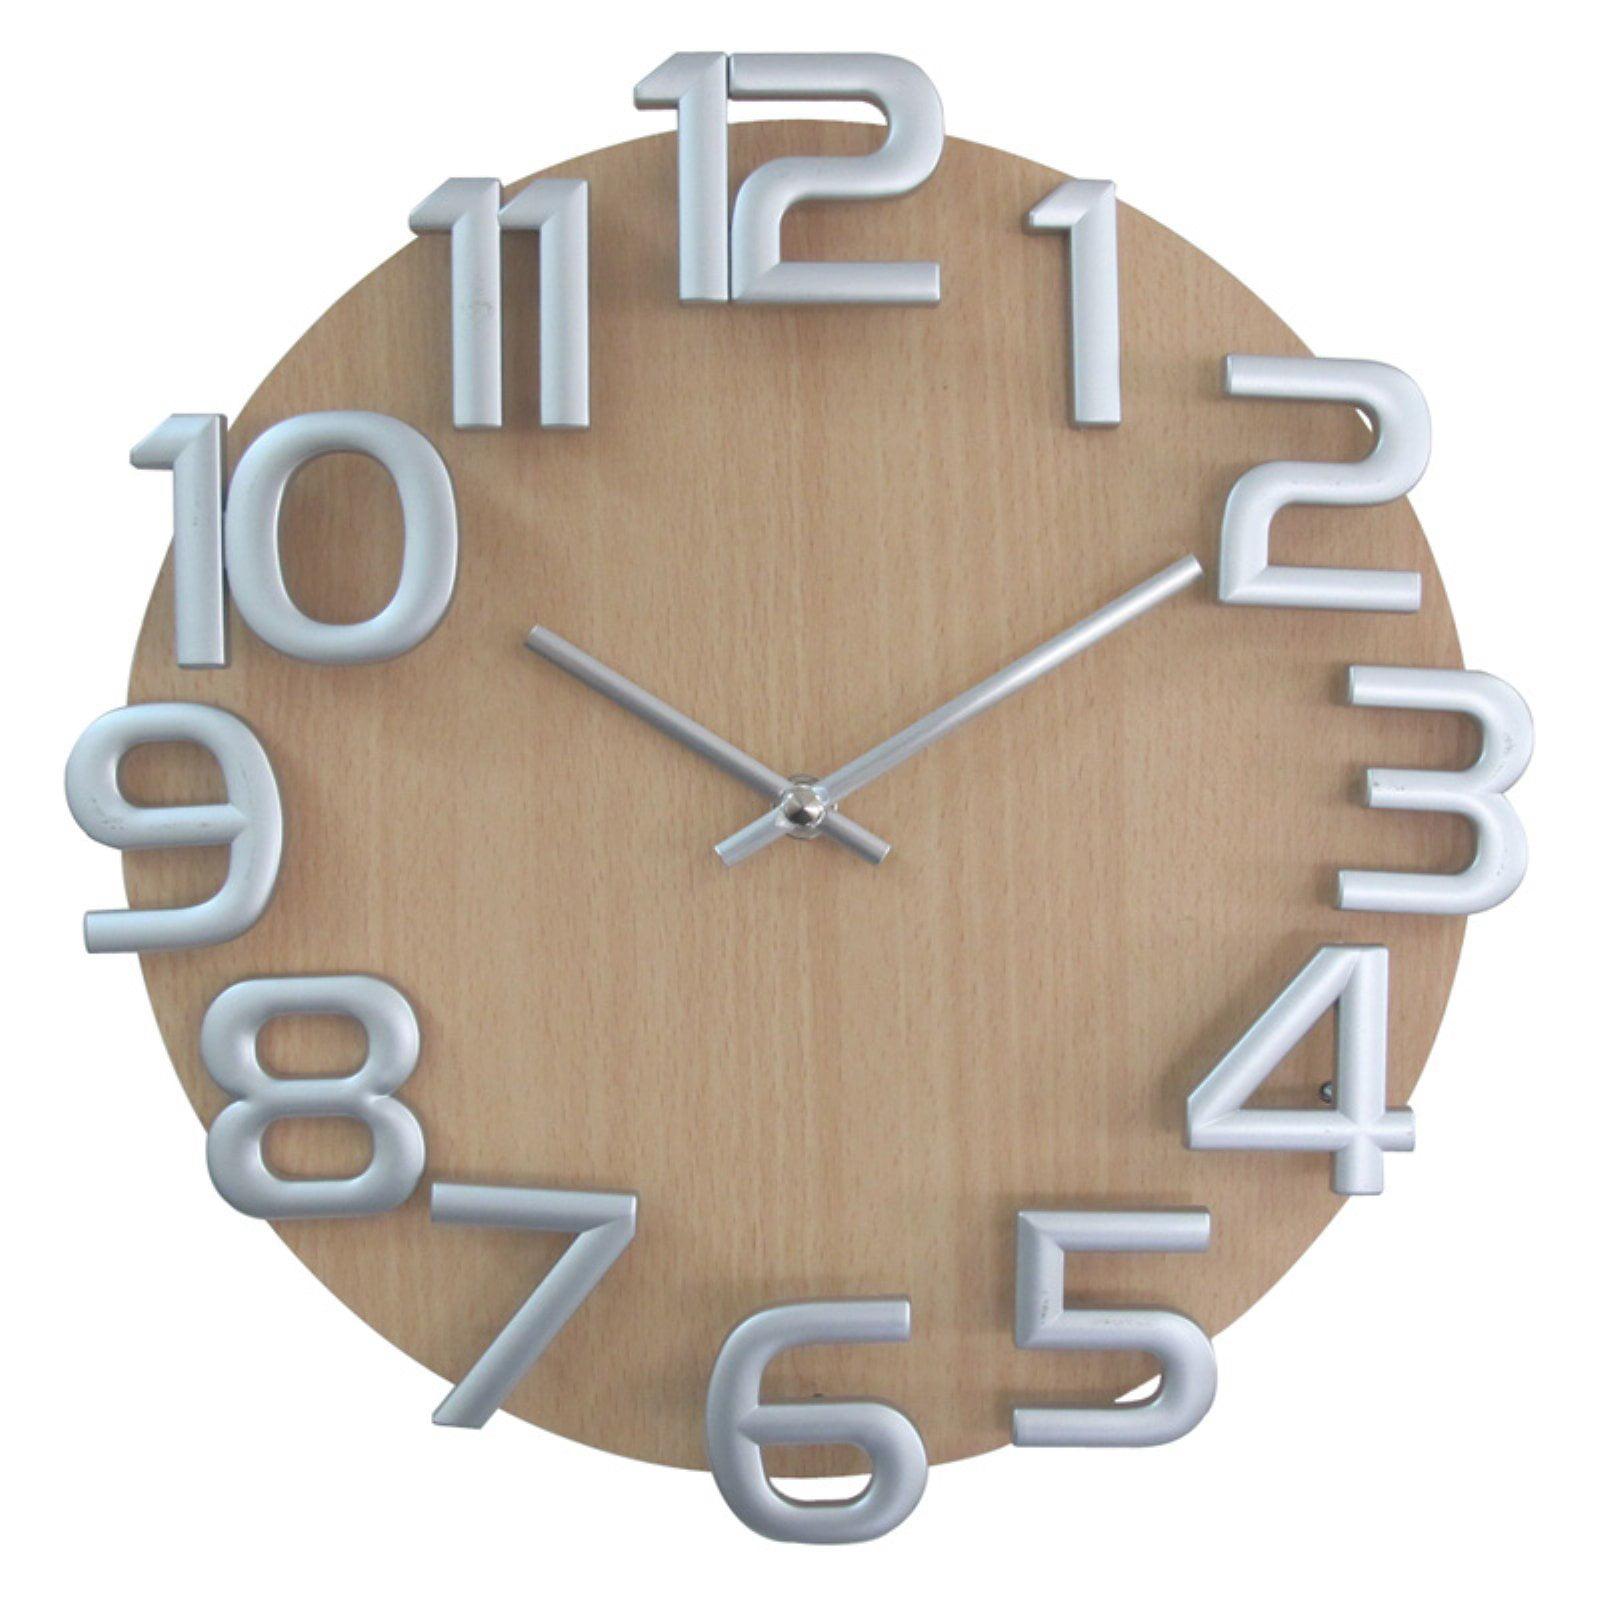 Control Brand Verichron Dimensions 12.5 in. Wall Clock